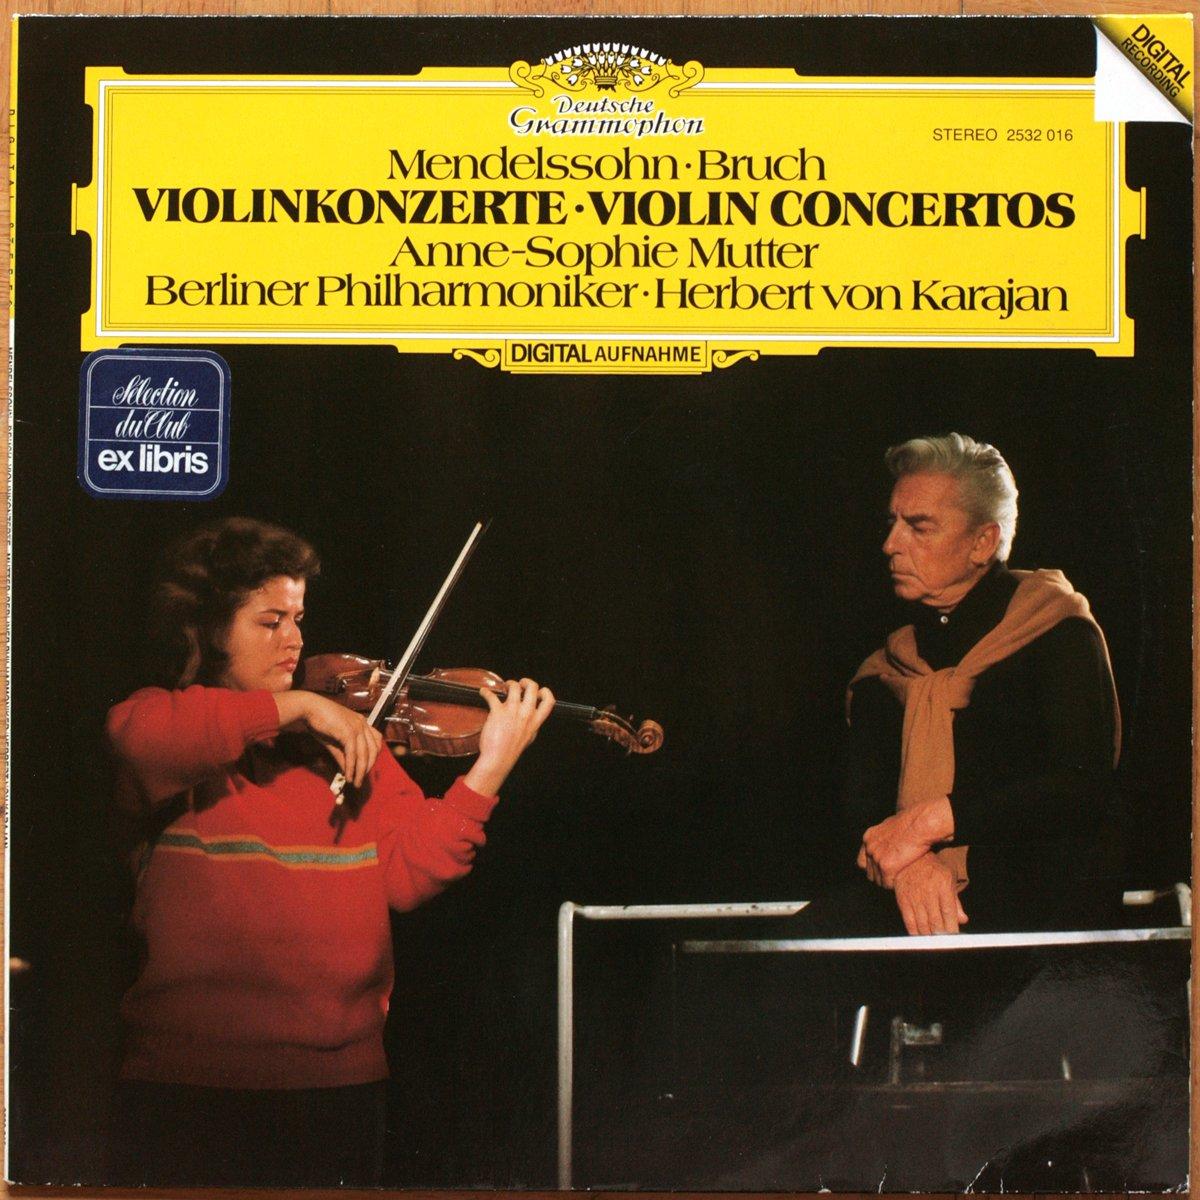 DGG 2532016 Mendelssohn Bruch Concerto Violon Mutter Karajan